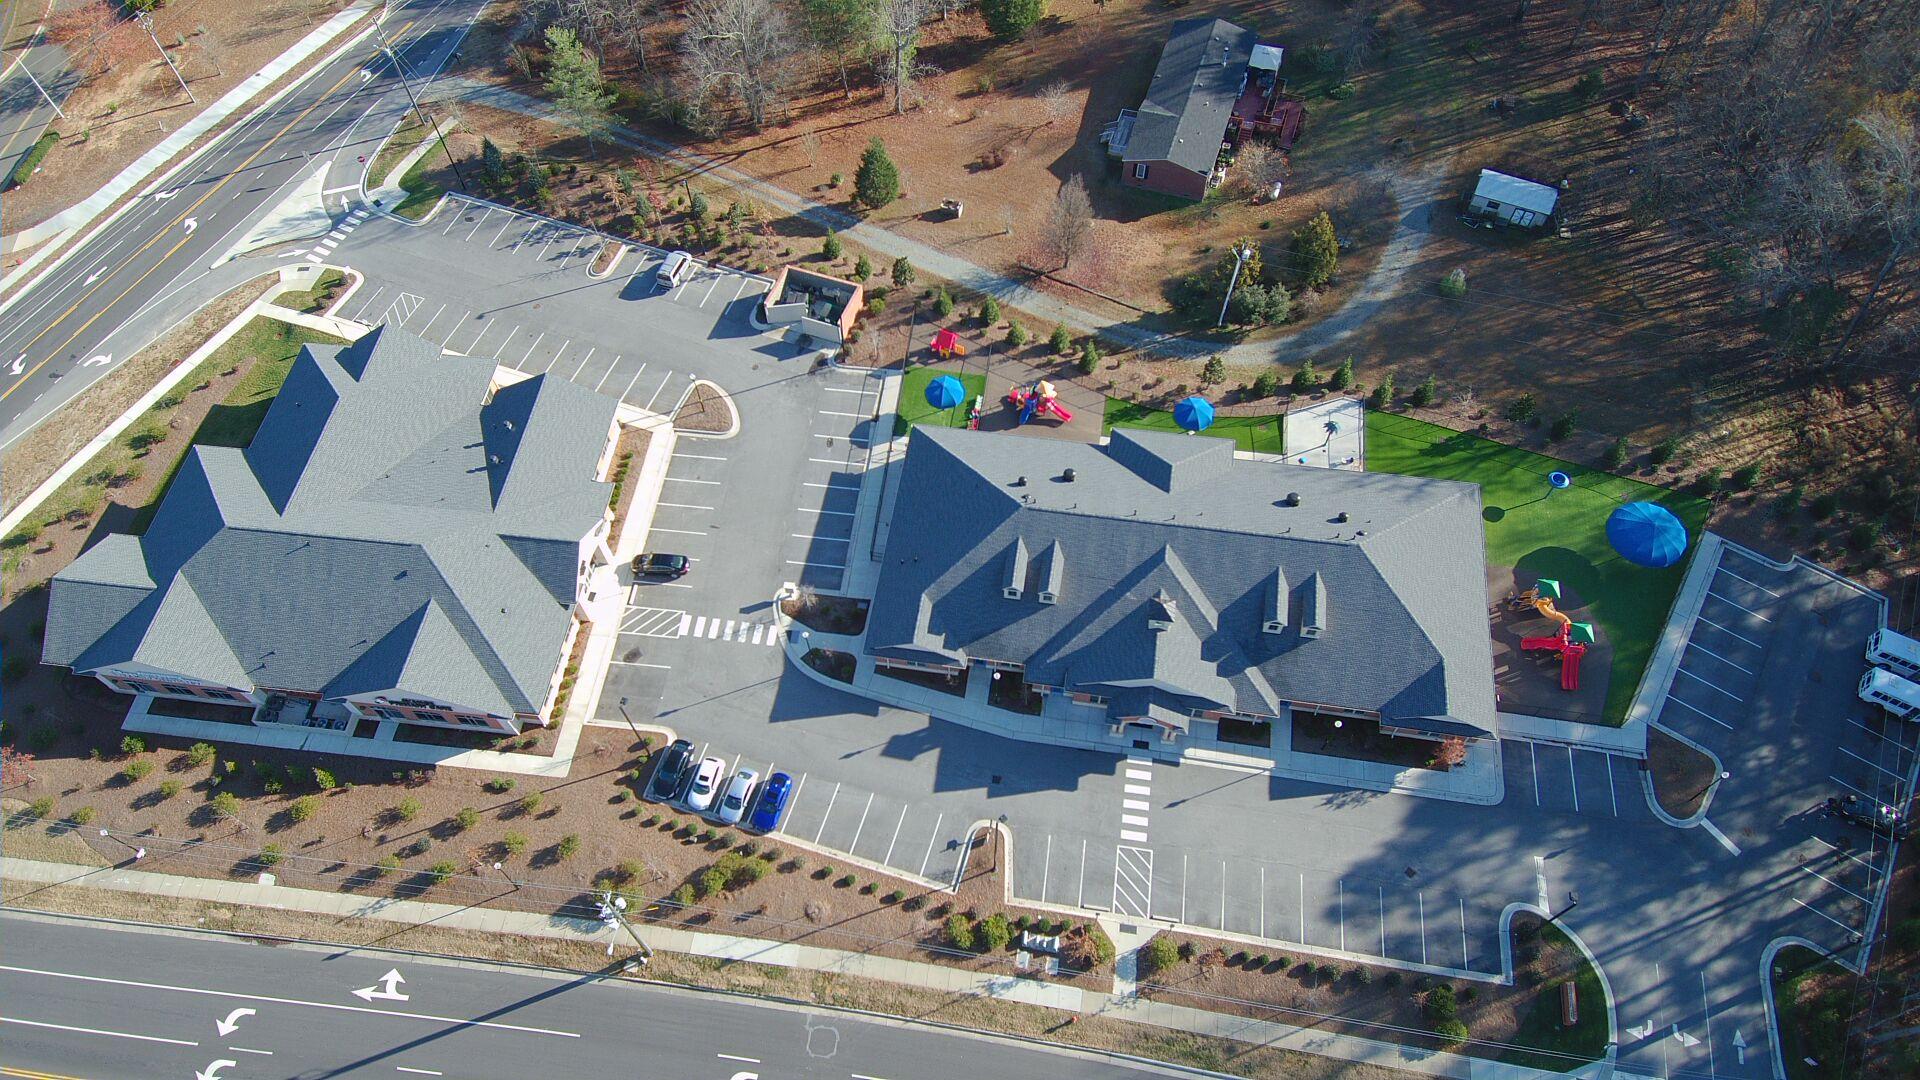 Olive Chapel West Rainbow Child Care Center